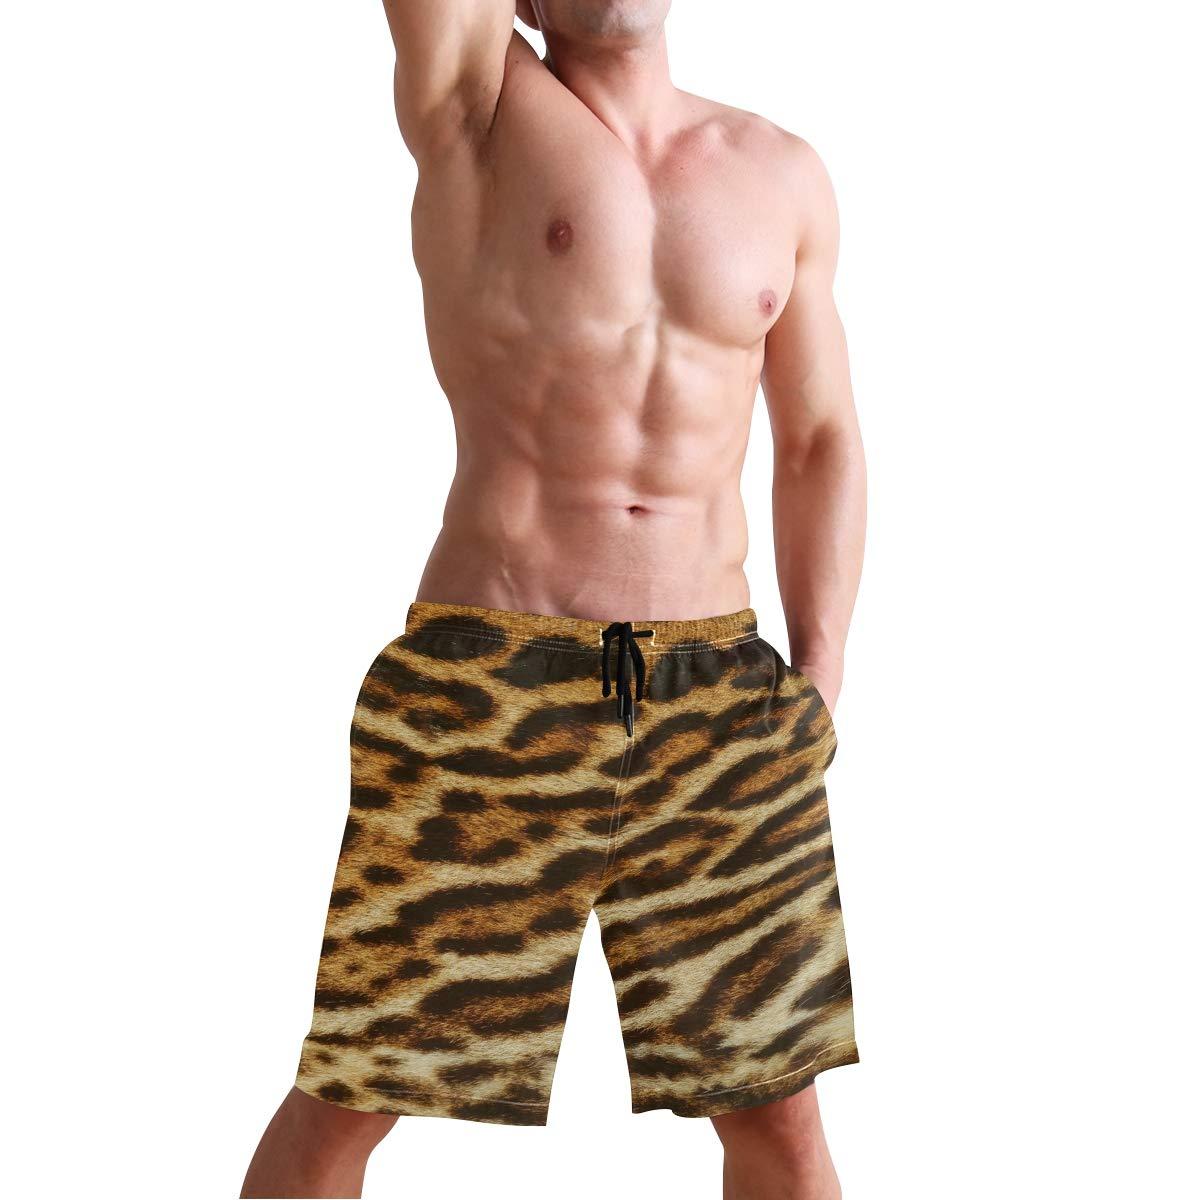 MALPLENA Fancy Animal Skin Mens Beach Shorts Board Shorts Mesh Lining